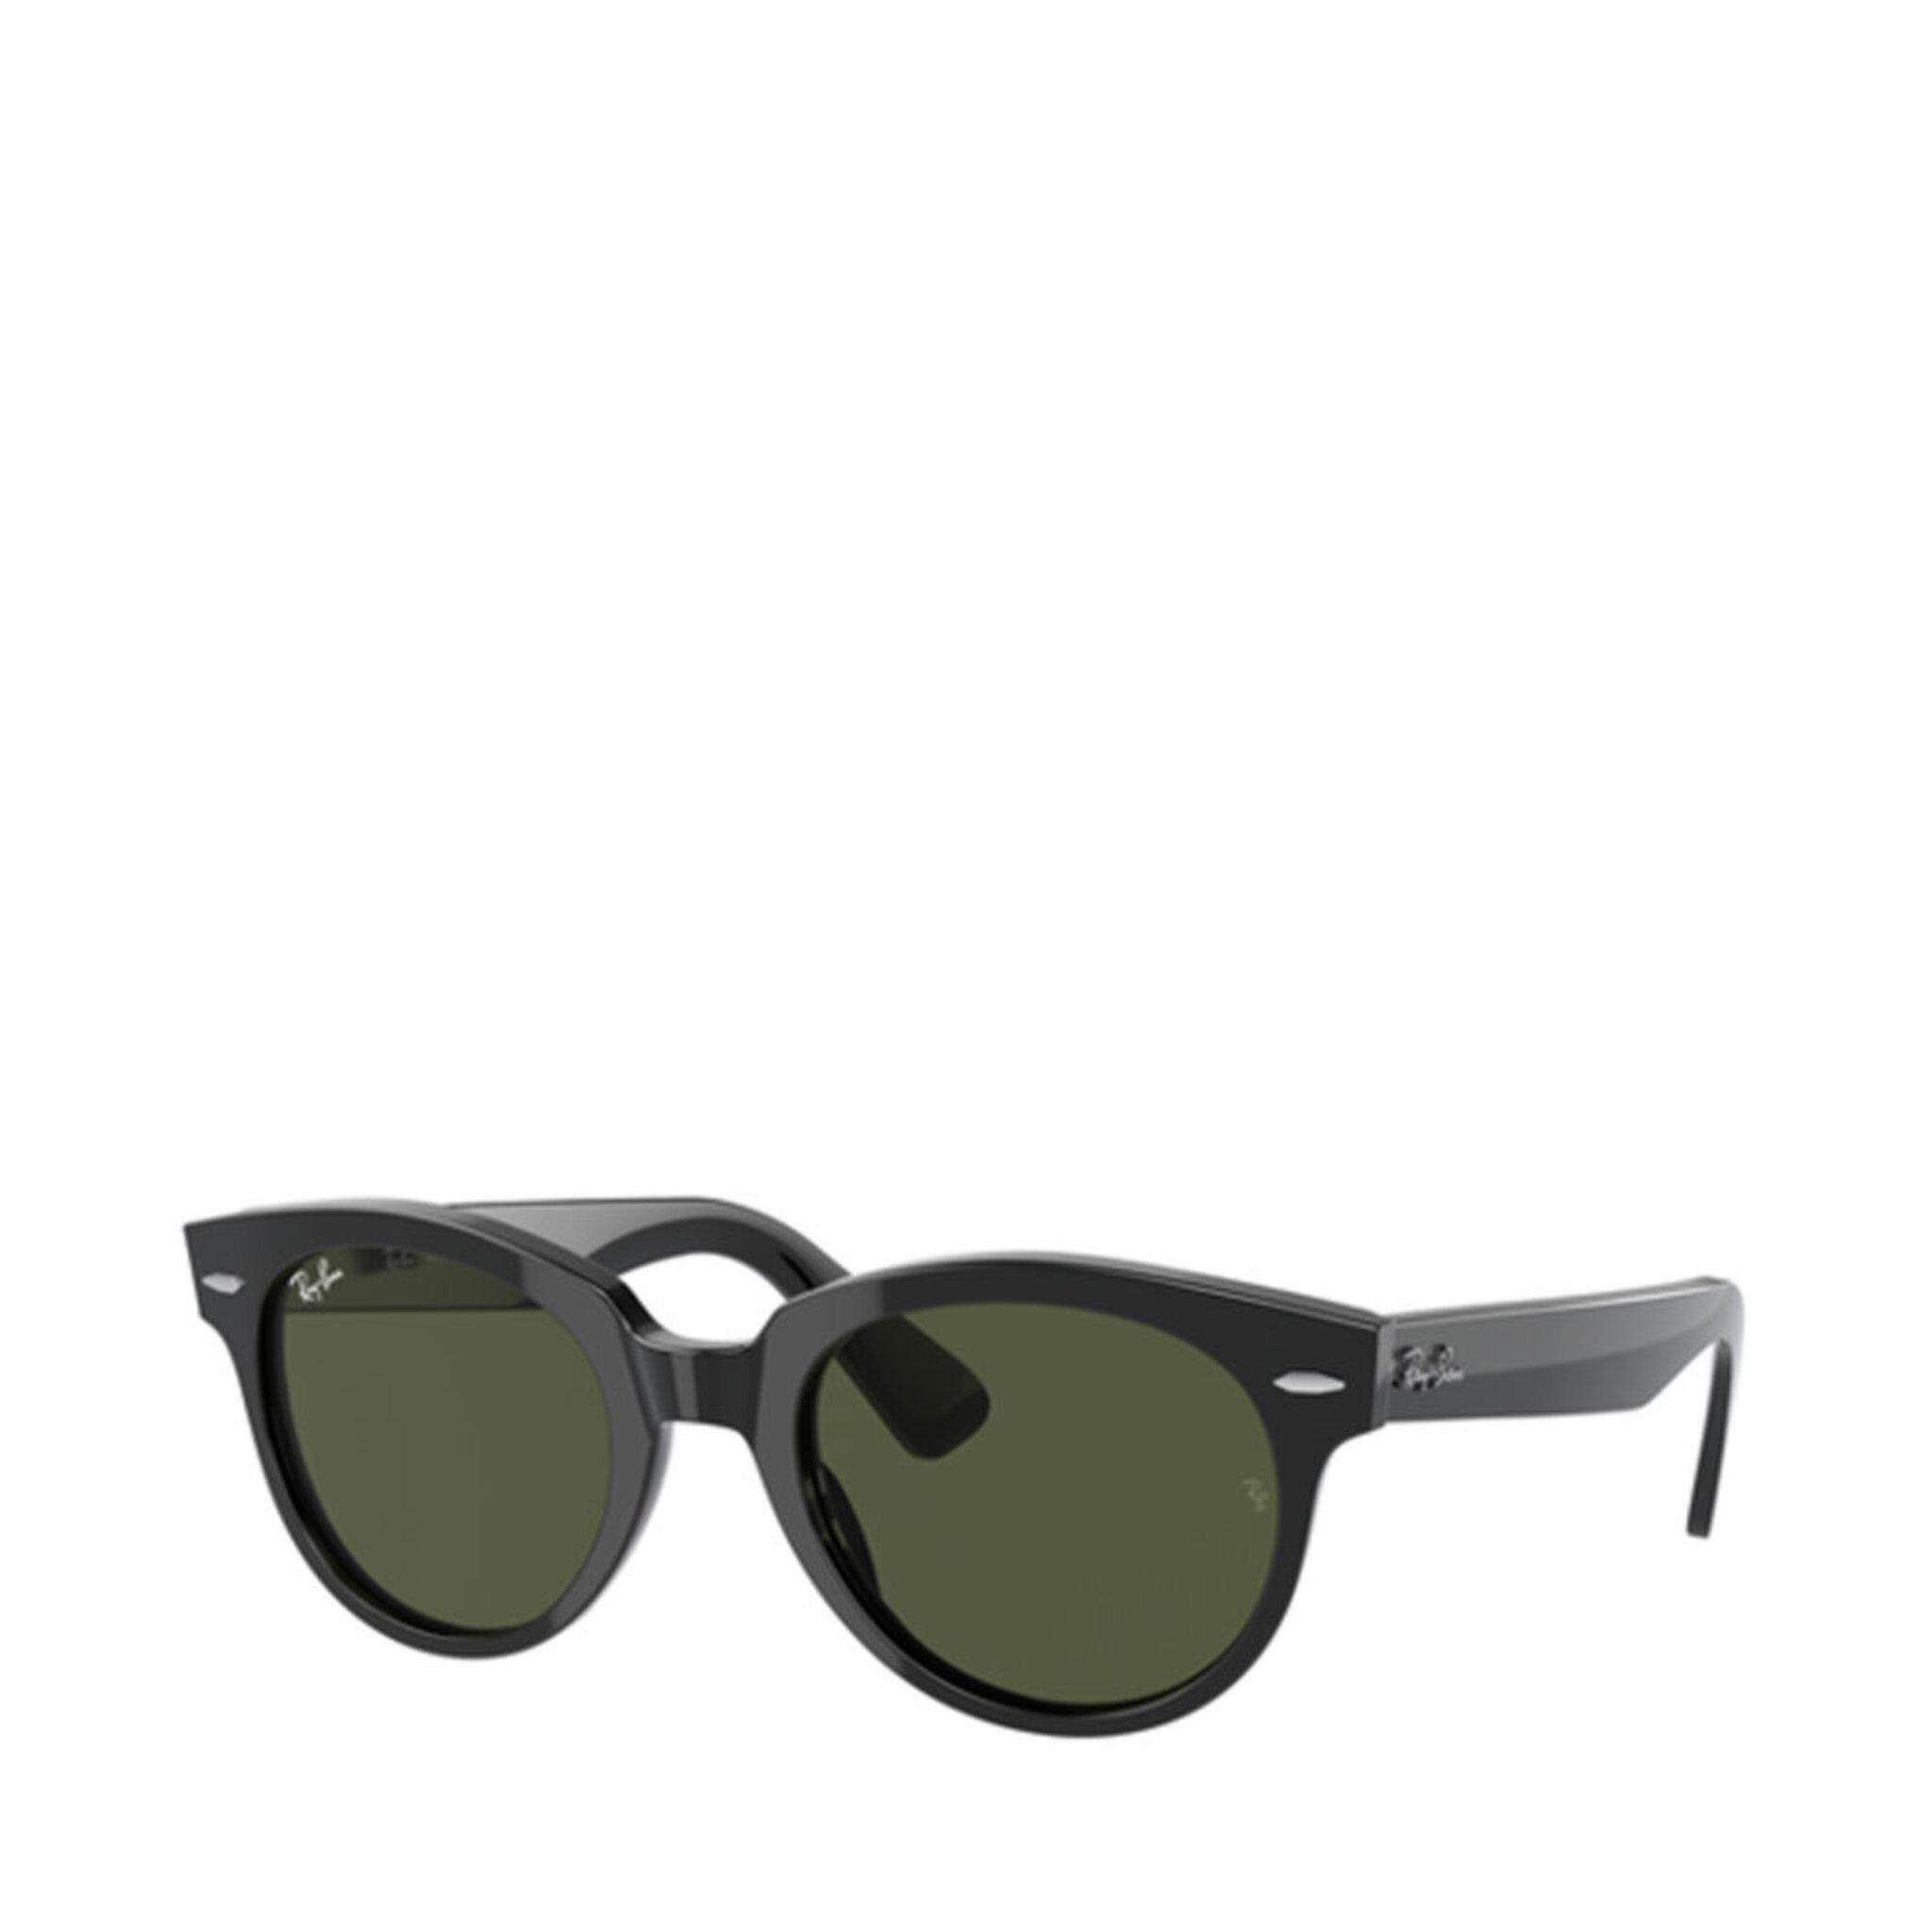 Sunglasses ORION 0RB2199, 52